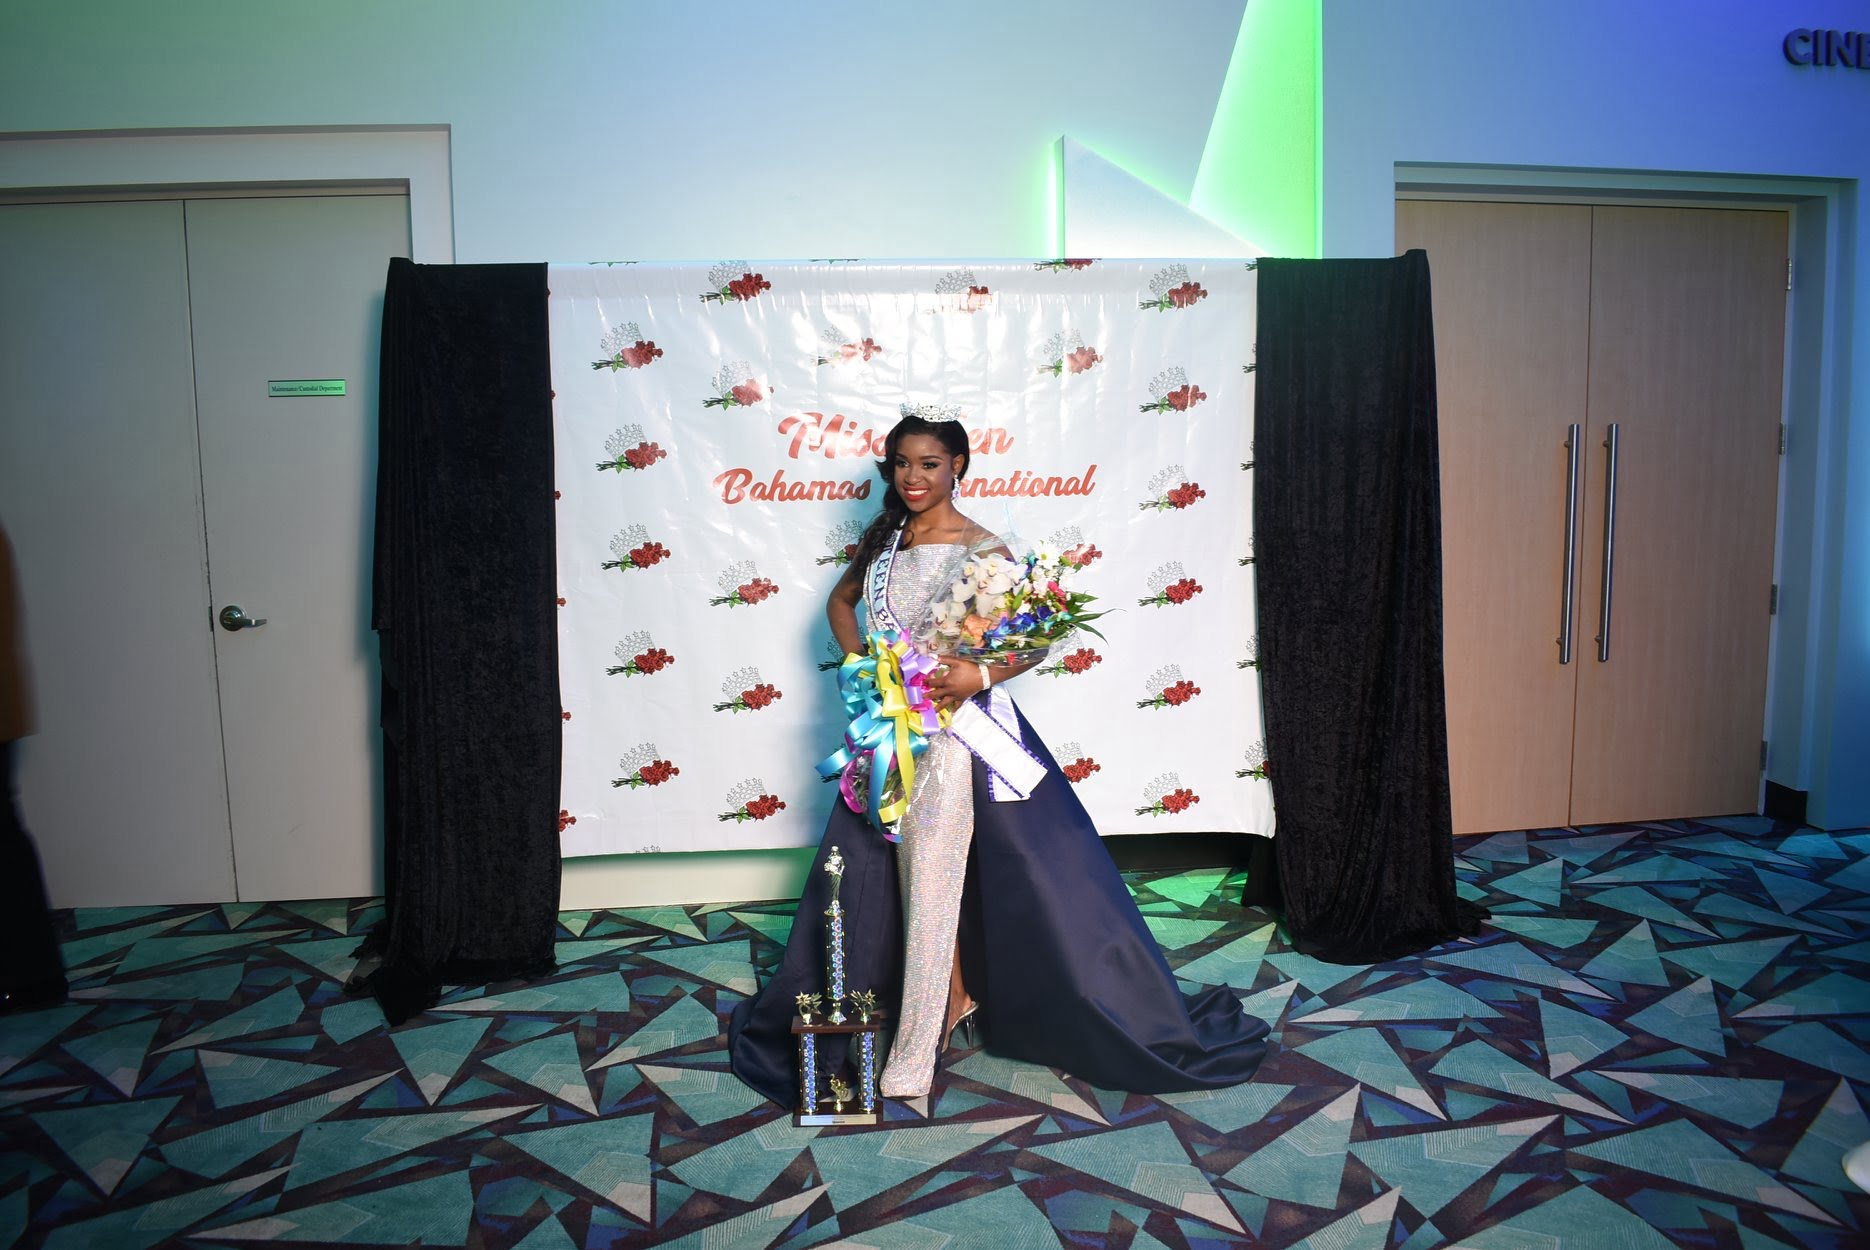 Abaco native is new Miss Teen Bahamas International